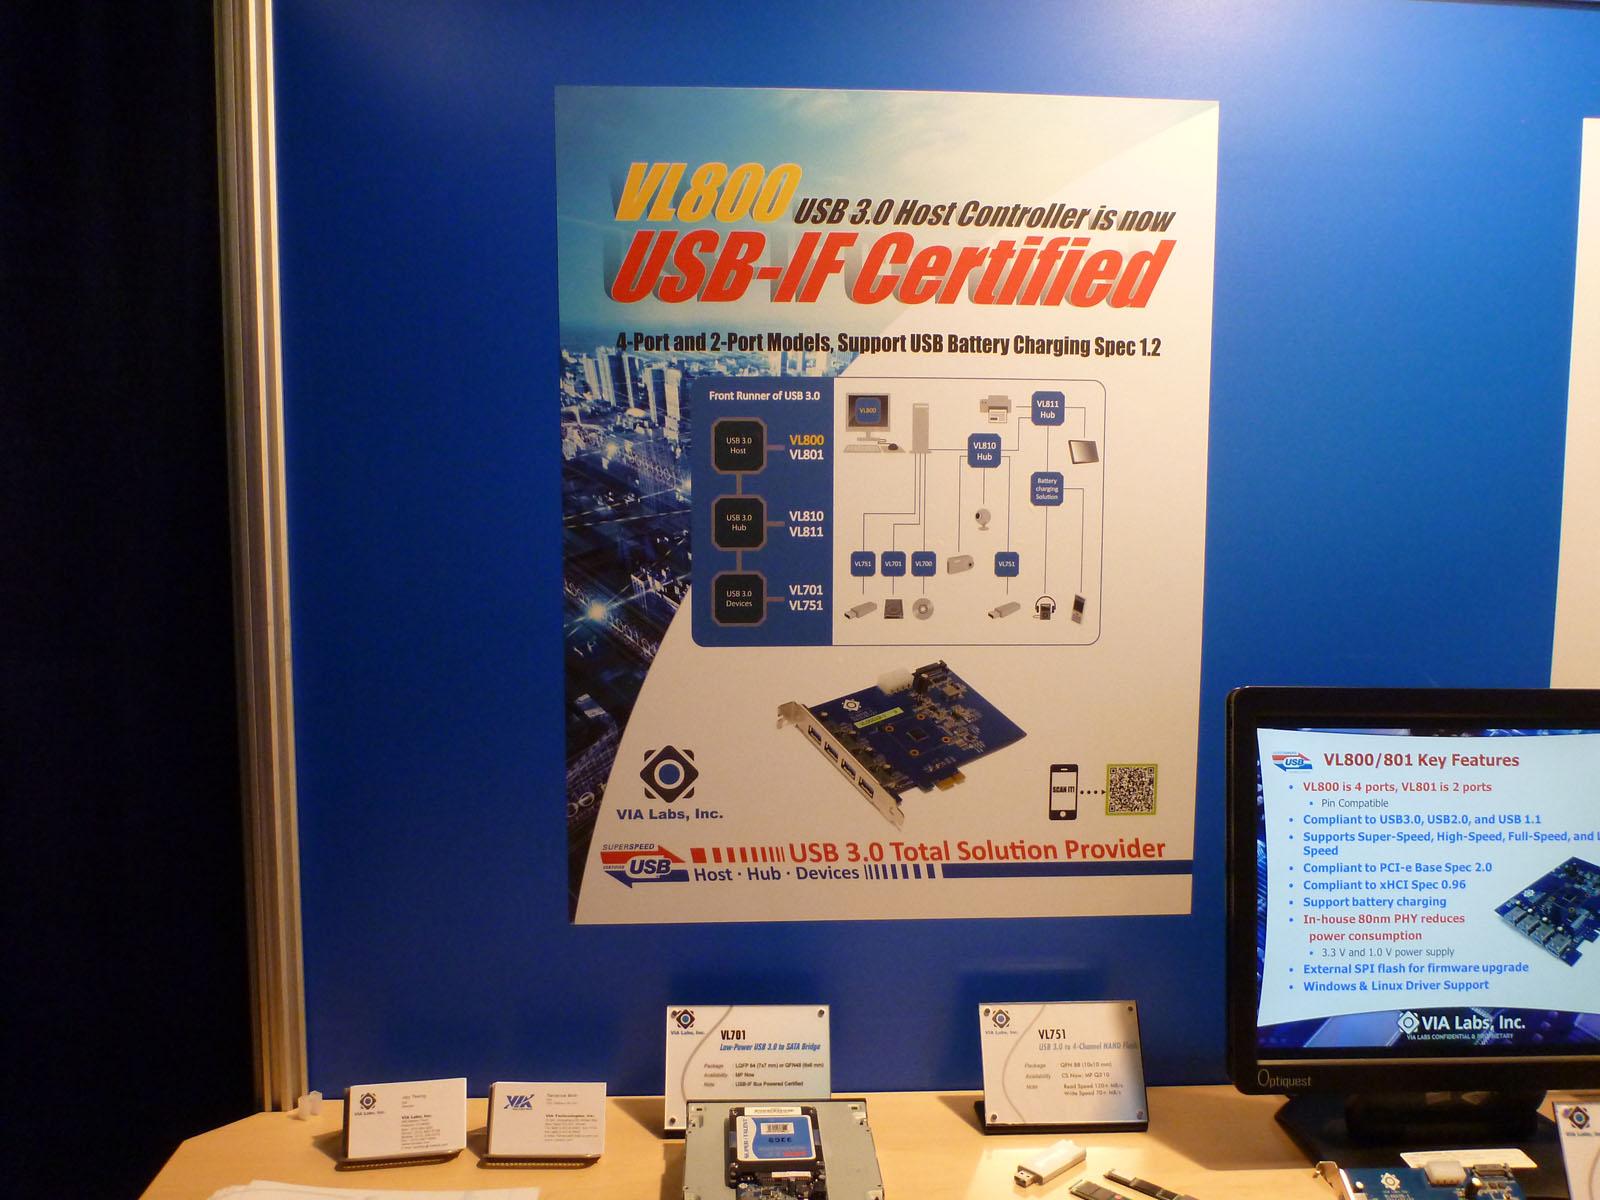 VIA VL800/801 USB 3.0 Host Controller Last